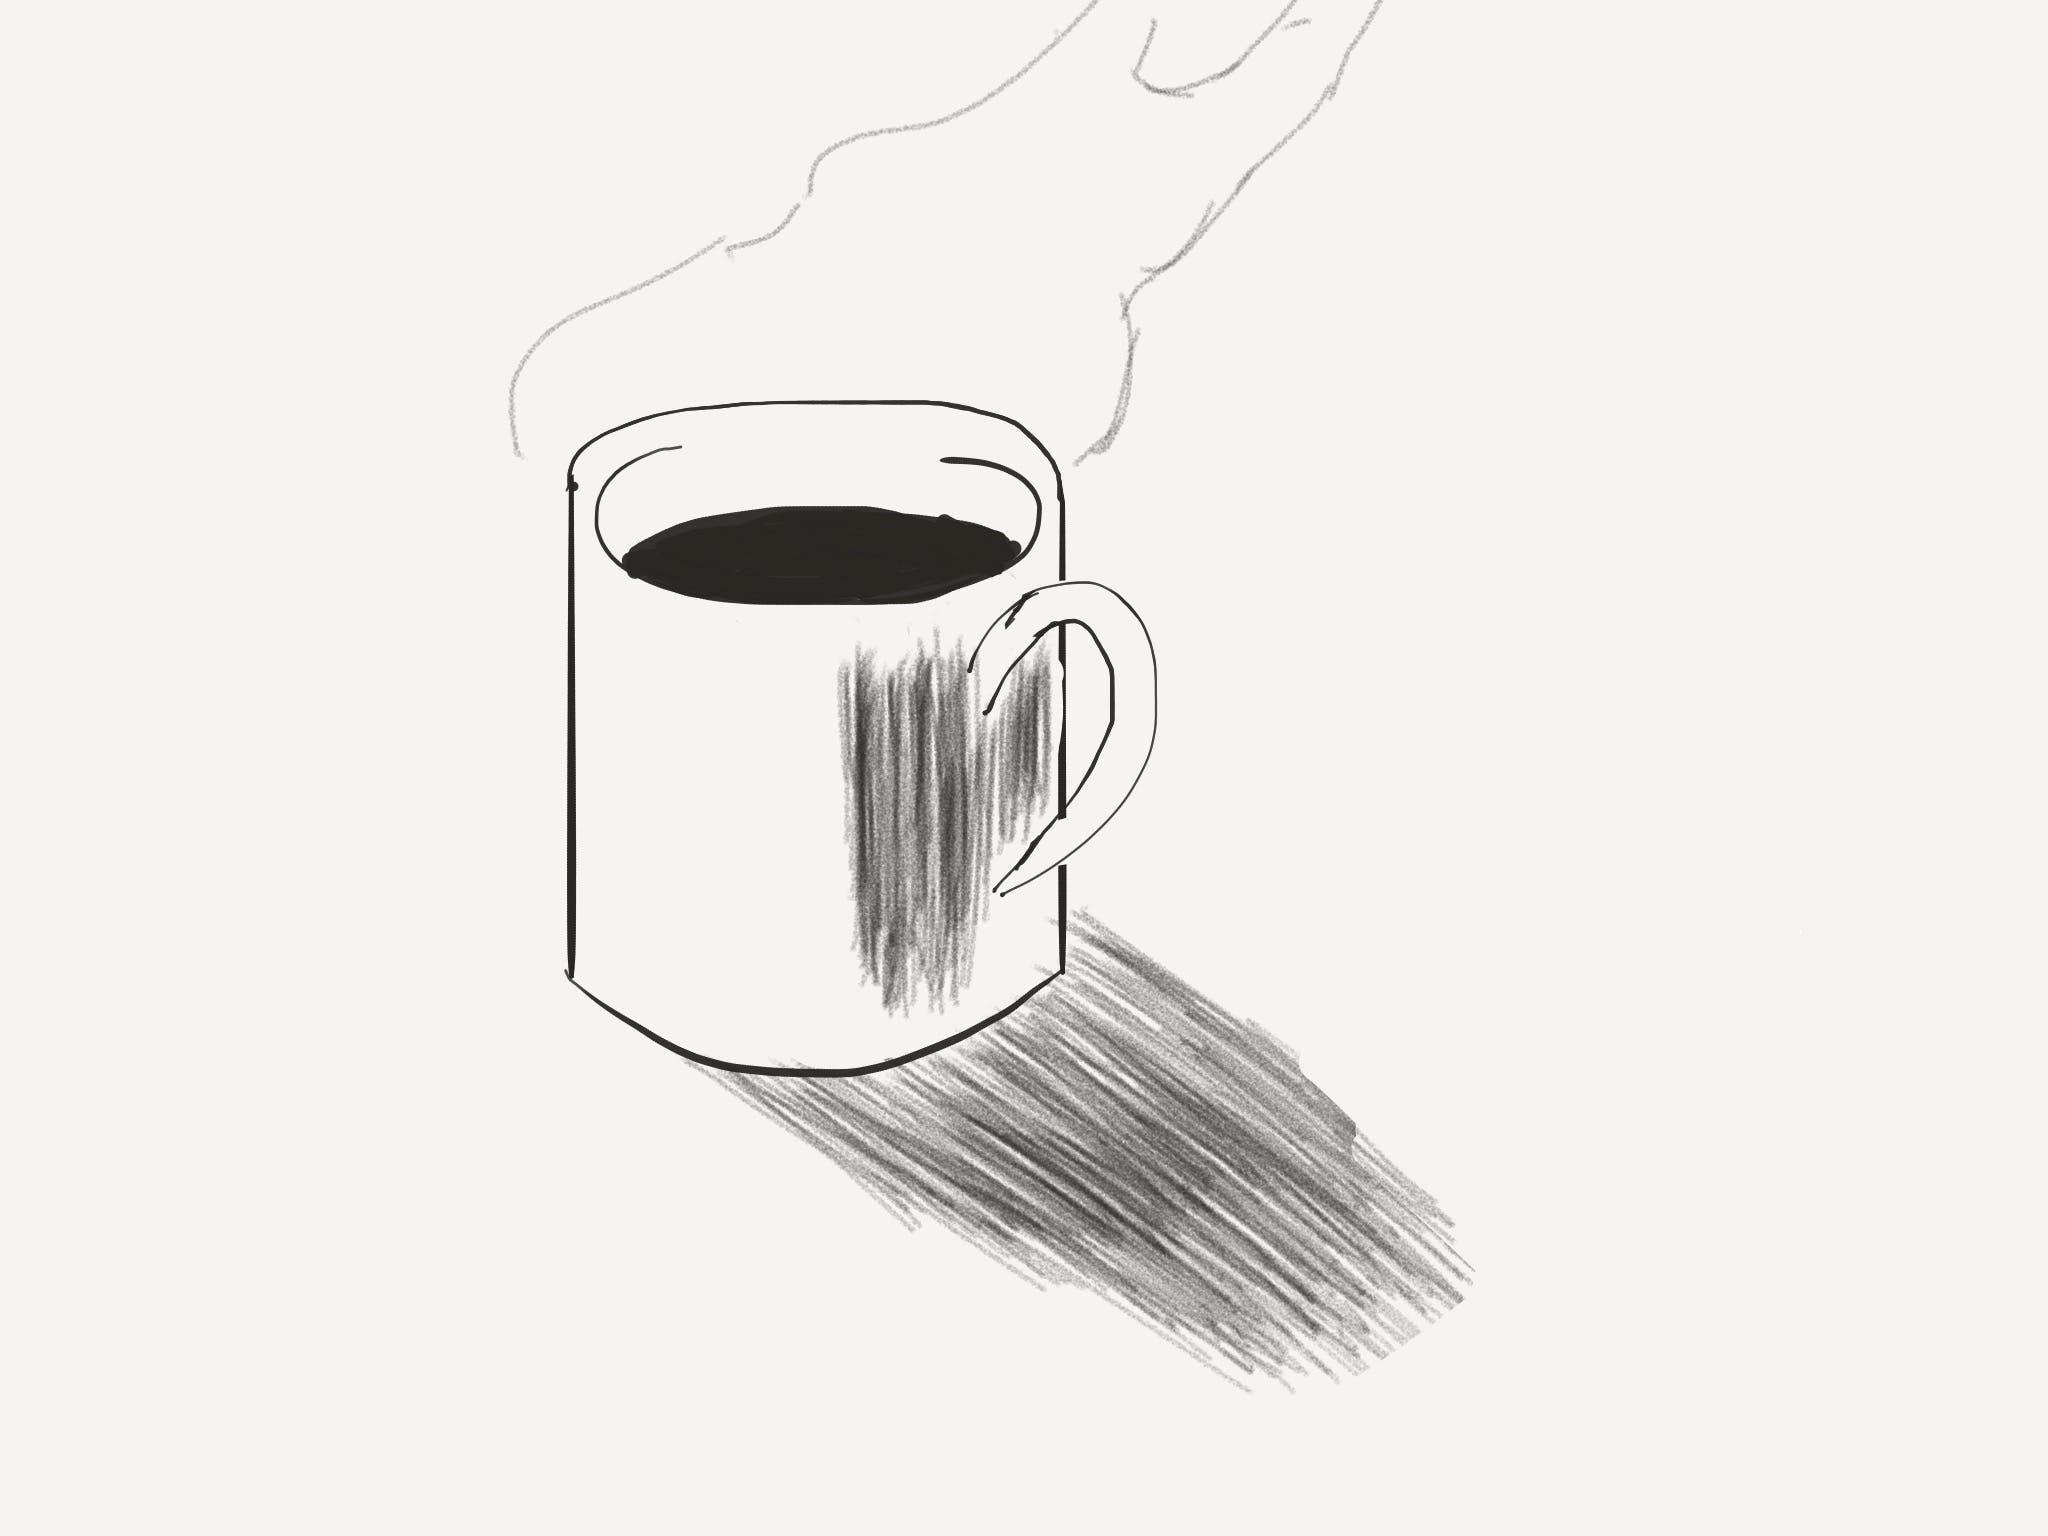 Free stock photo of art, coffee mug, digital art, mug